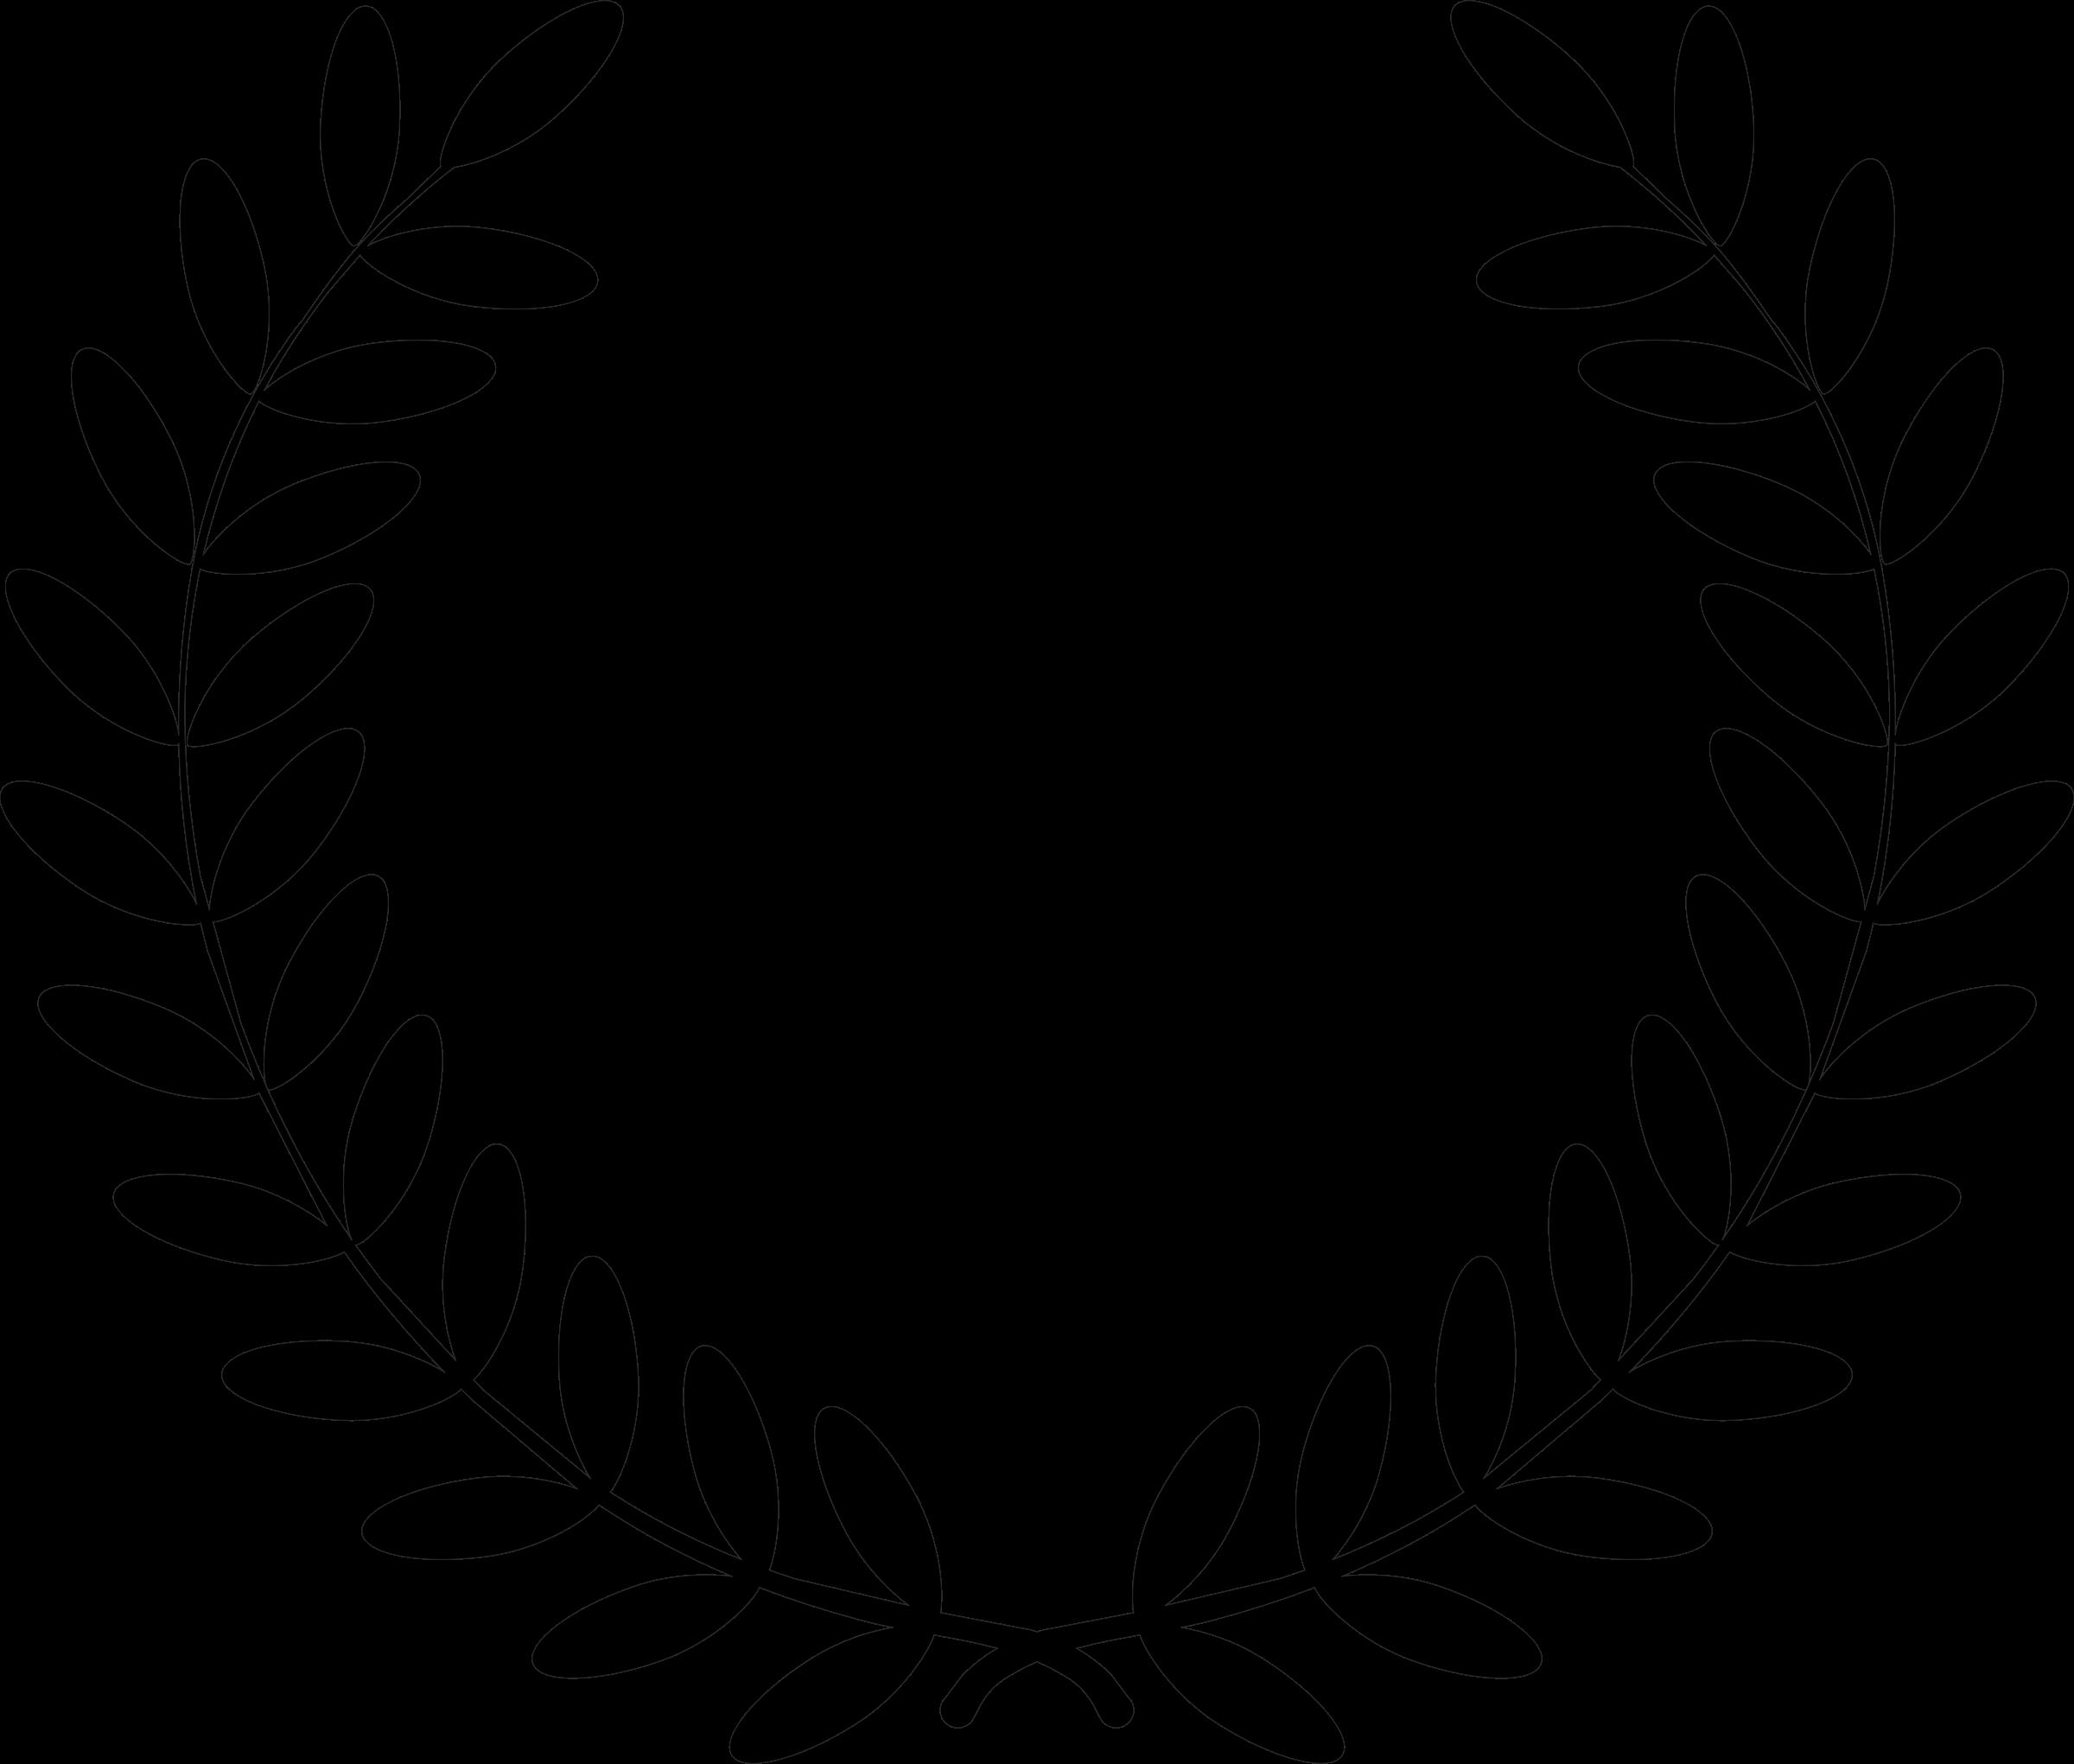 Wreath clipart crown Wreath Laurel Cliparts Clip Clip